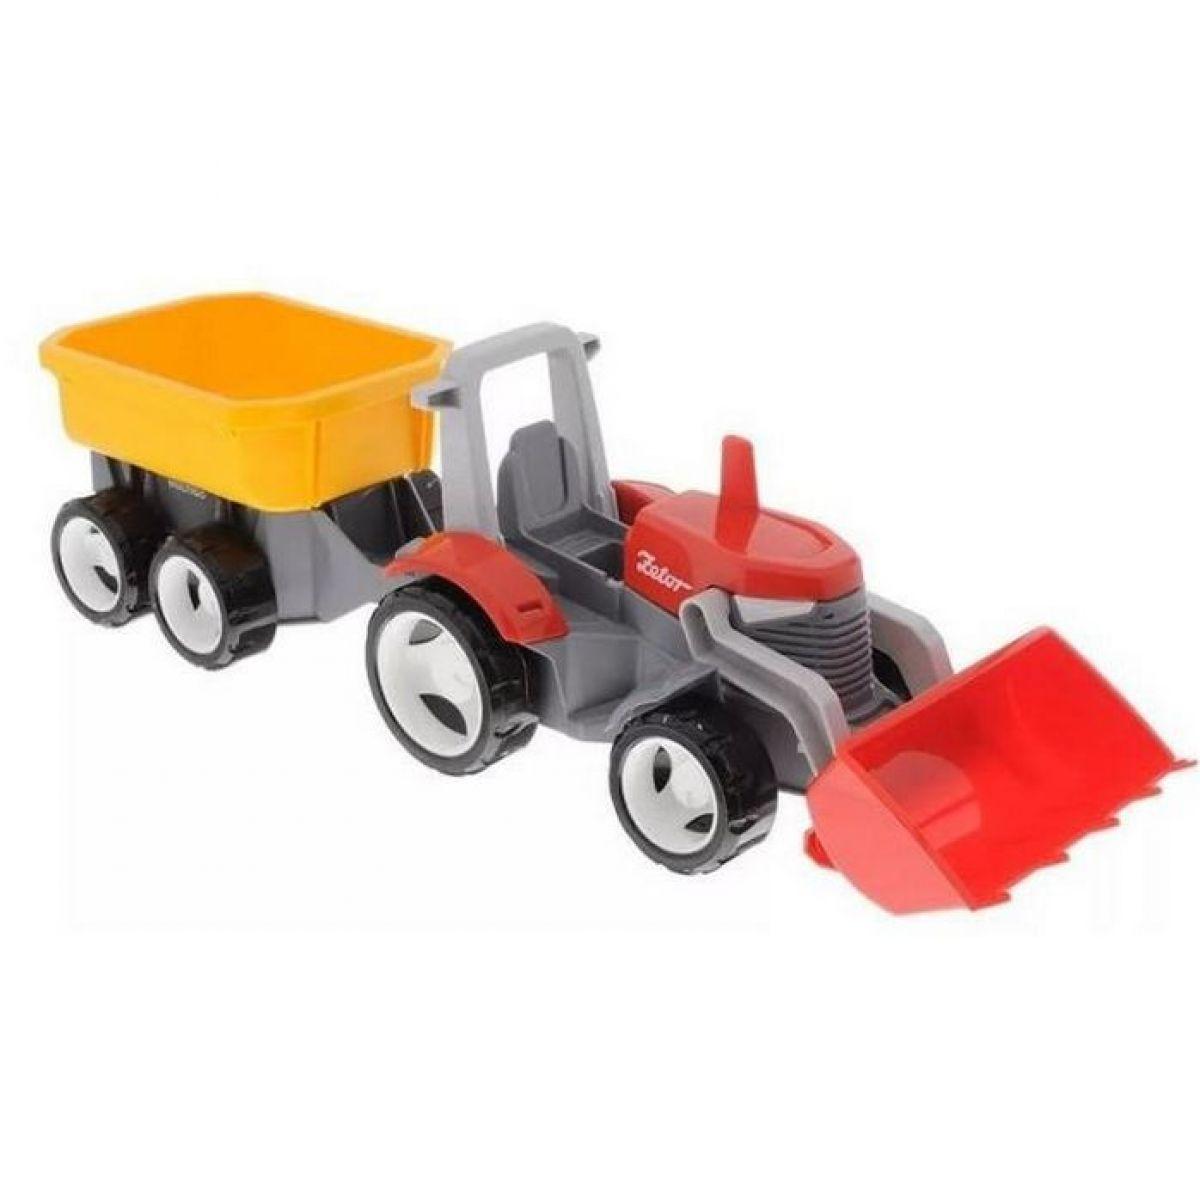 Igráček Multigo 1+2 traktor s přívěsem Eko balení